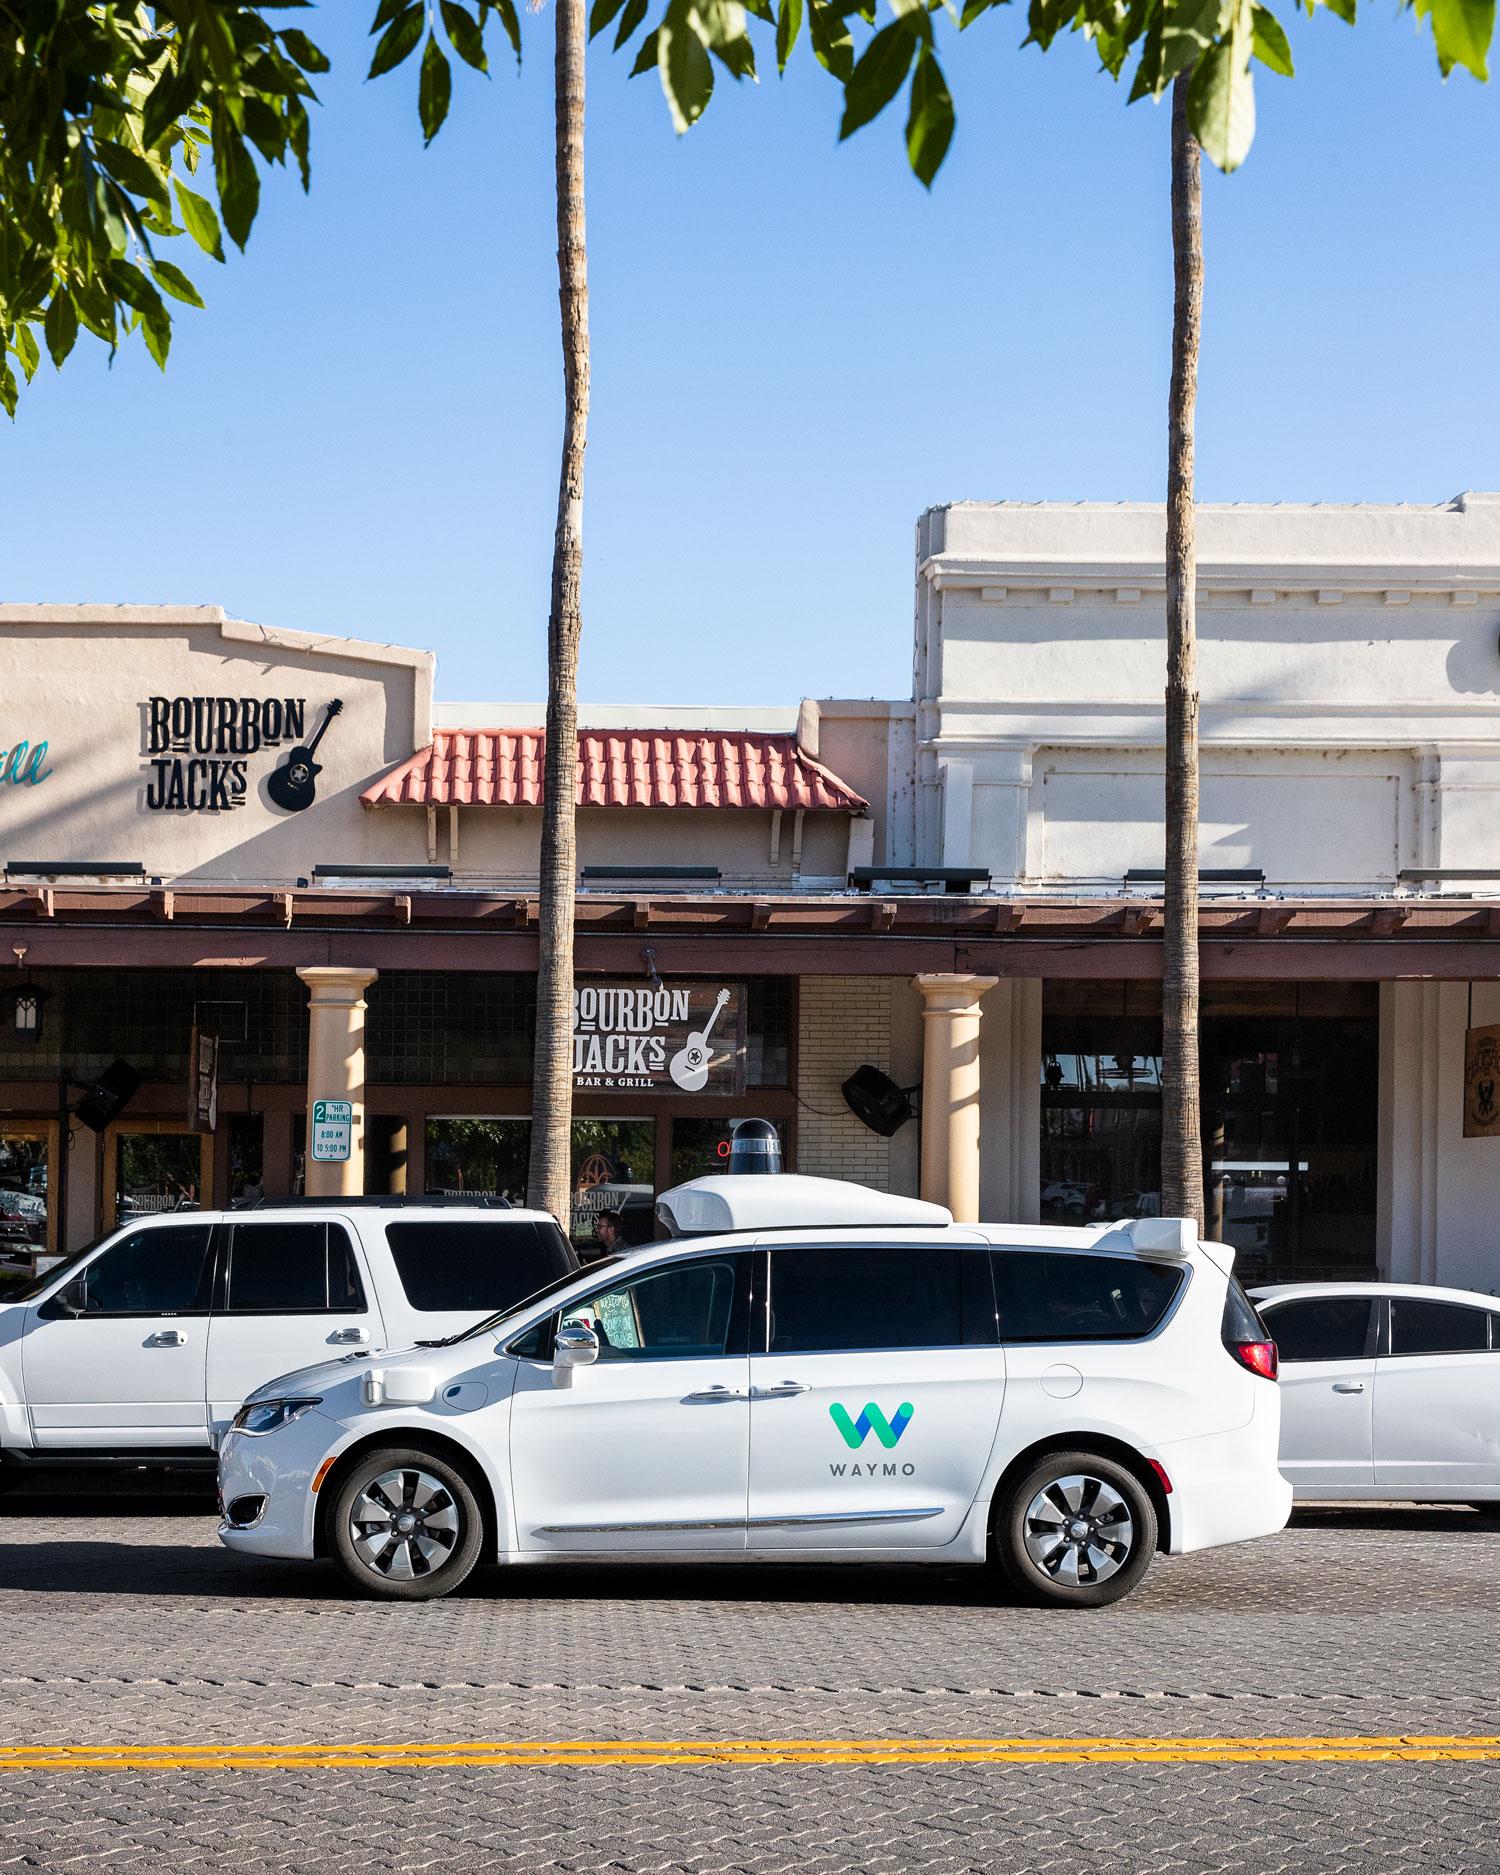 Phoenix will no longer be Phoenix if Waymo's driverless-car